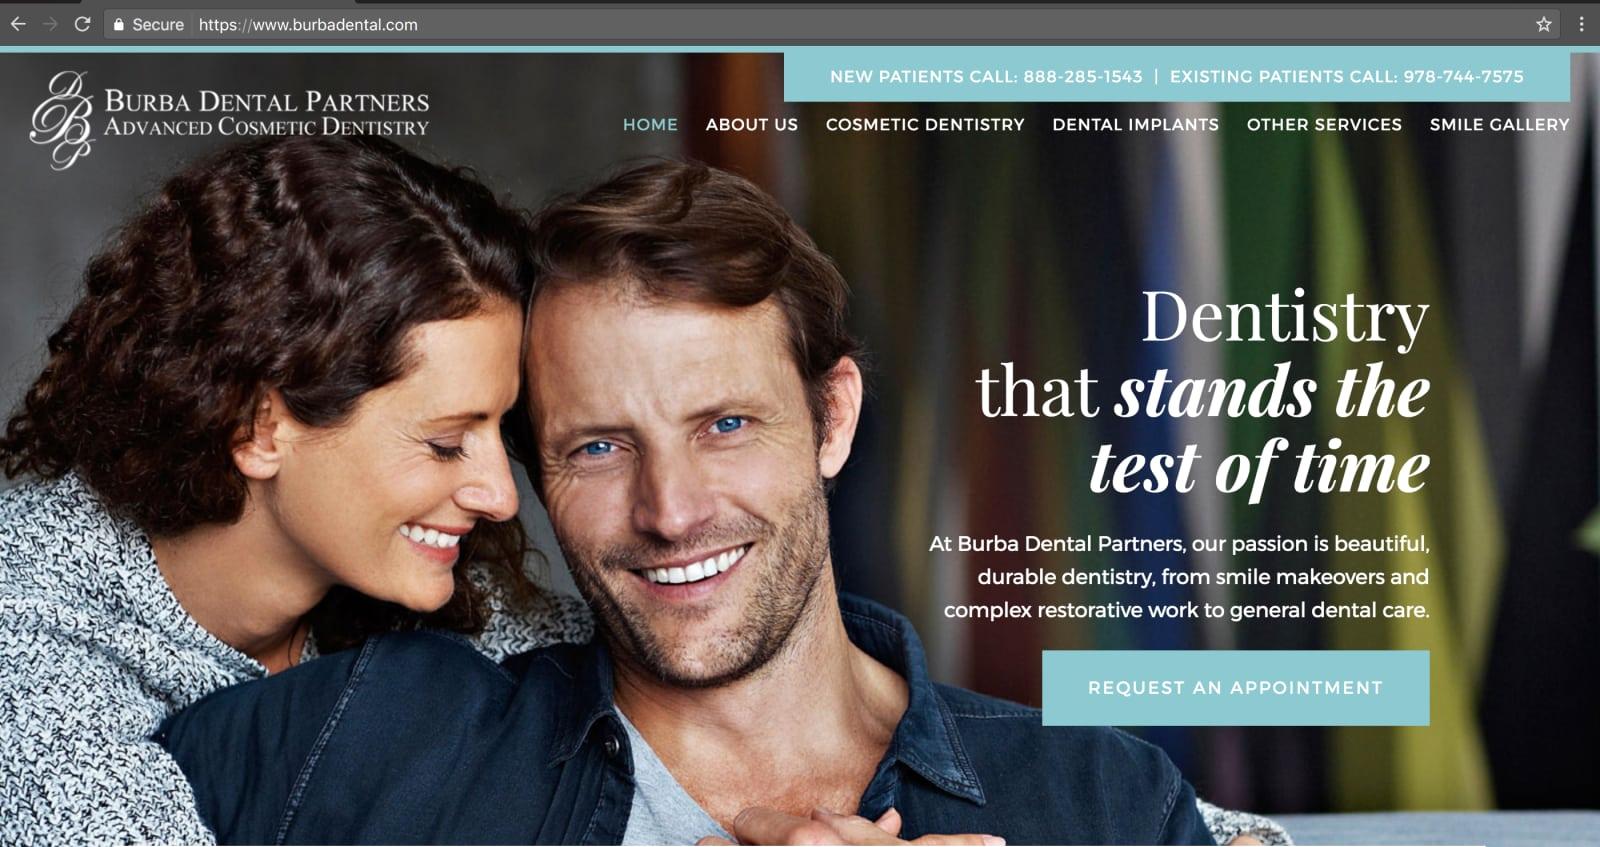 Burba Dental SolutionReach Example